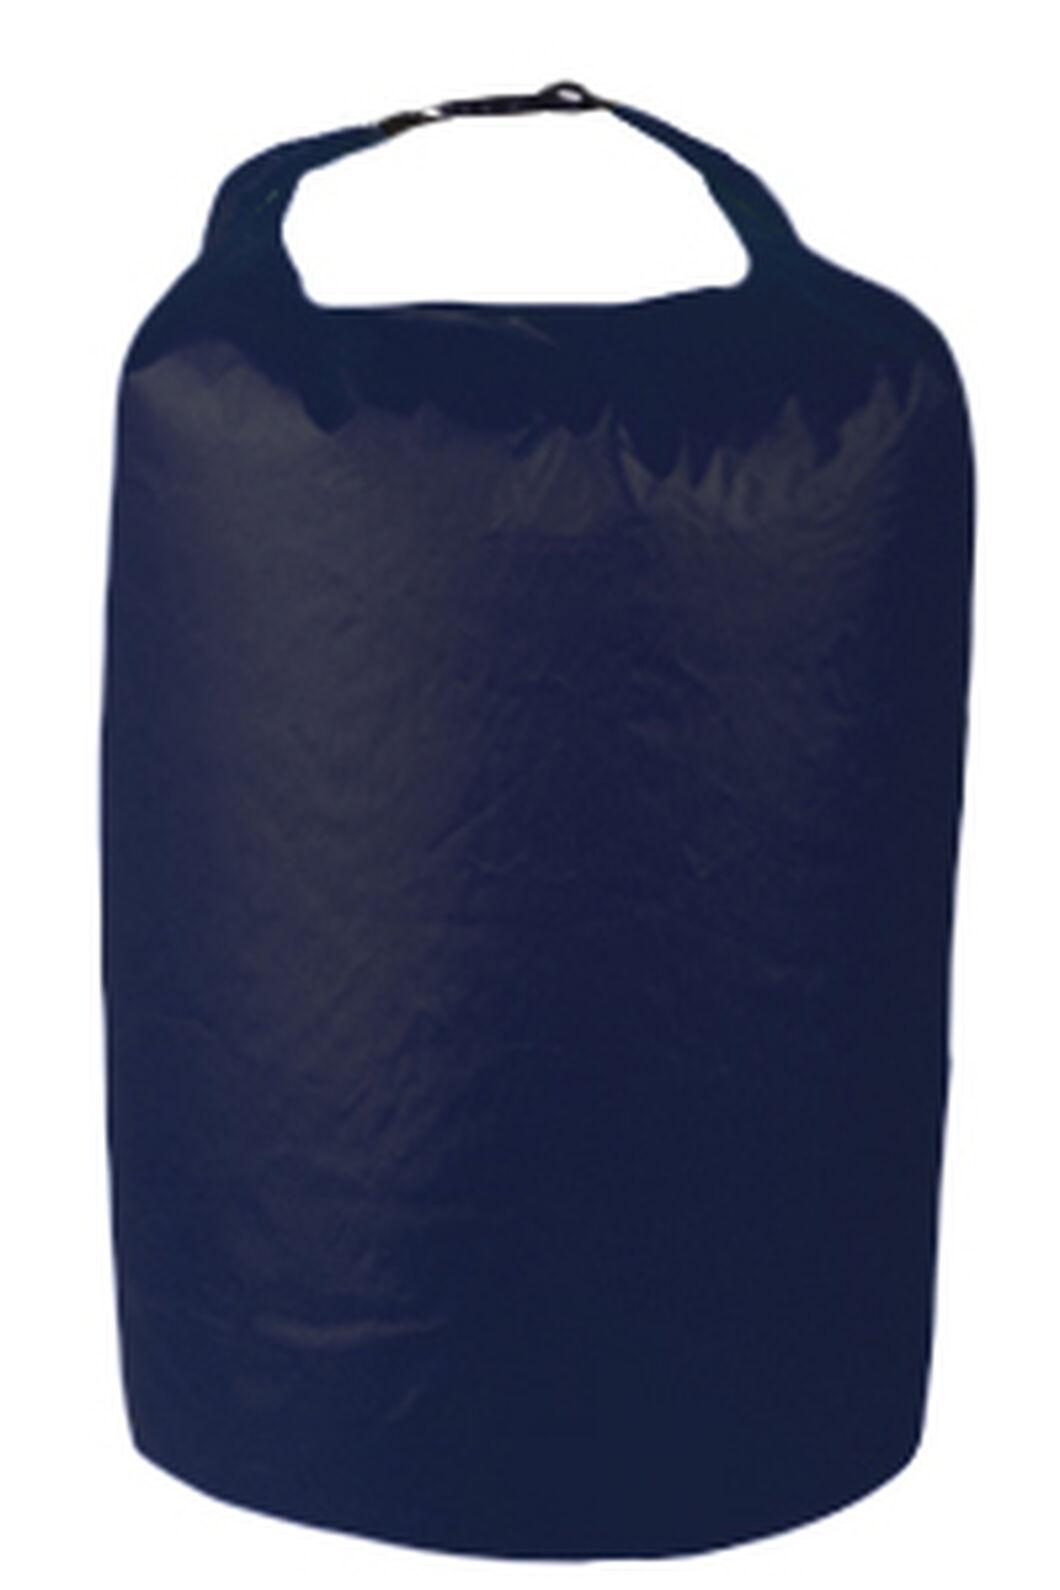 Macpac Ultralight Dry Bag 10 L, Sodalite Blue, hi-res